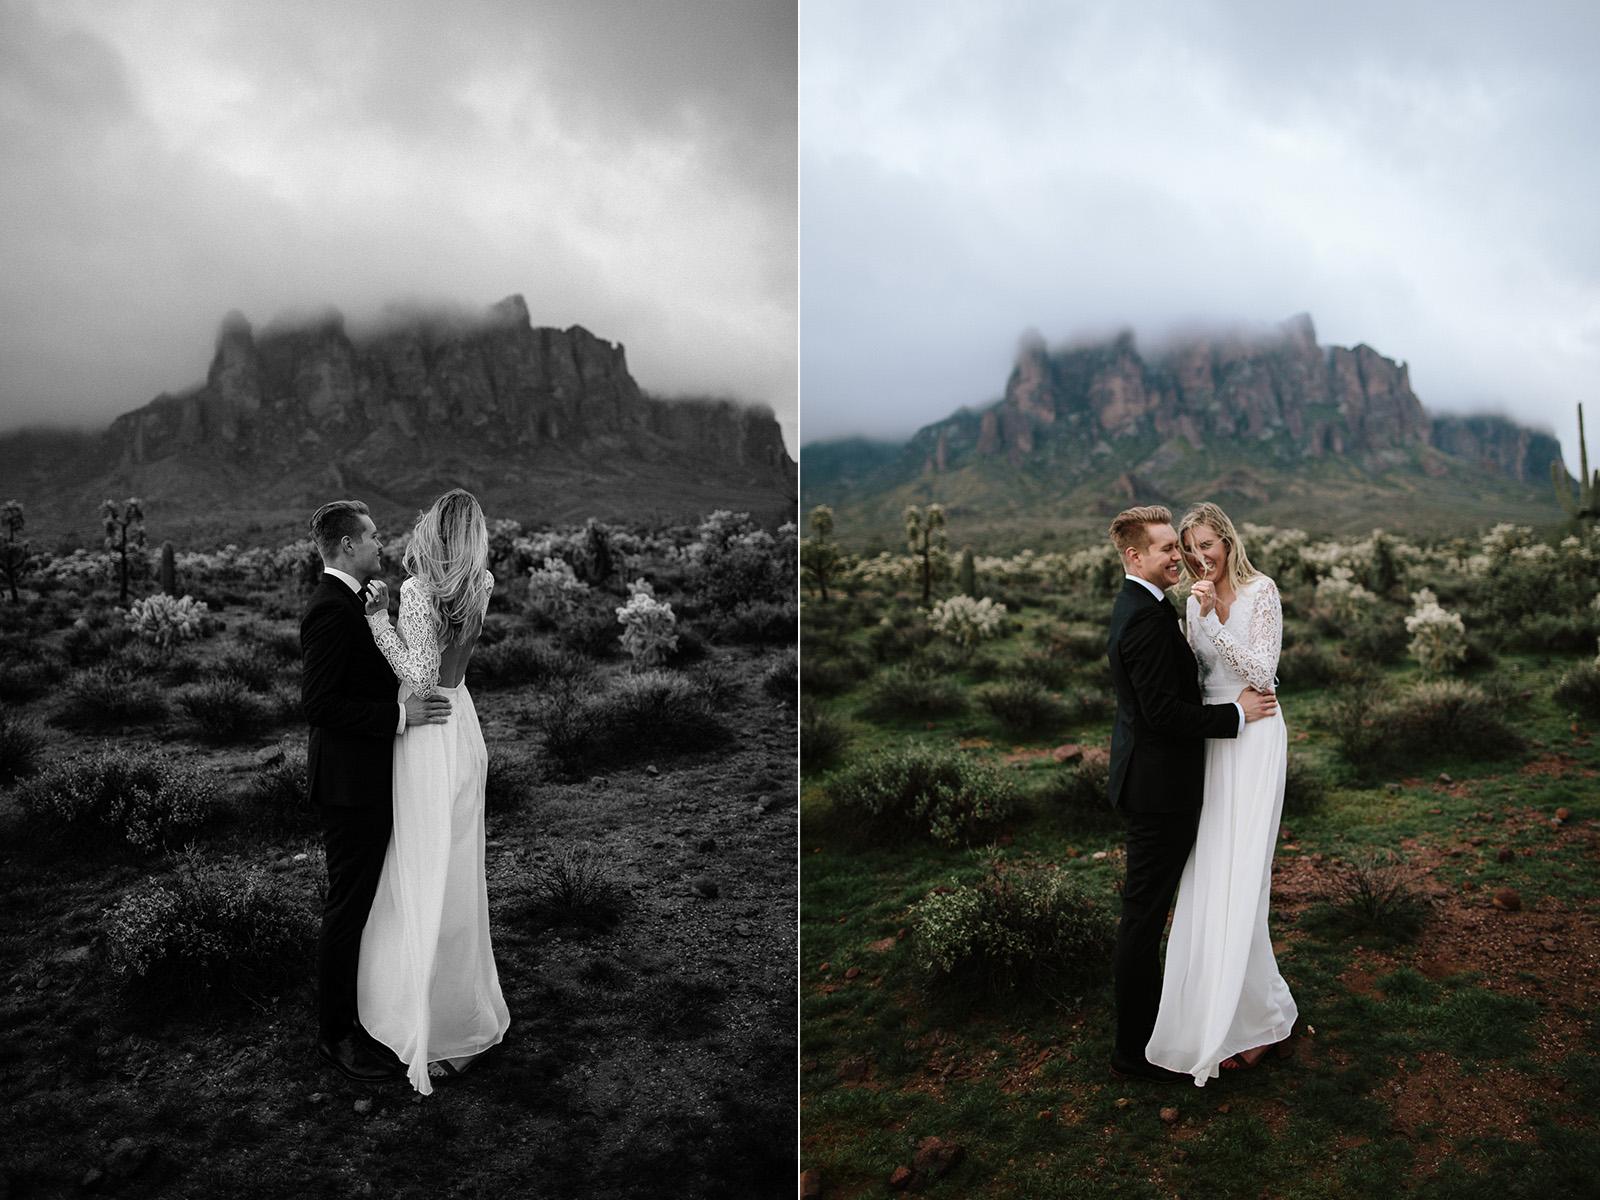 phoenix-mesa-elopement-wedding-photographer-lost-dutchman-state-park-superstitious-mountains-19.jpg